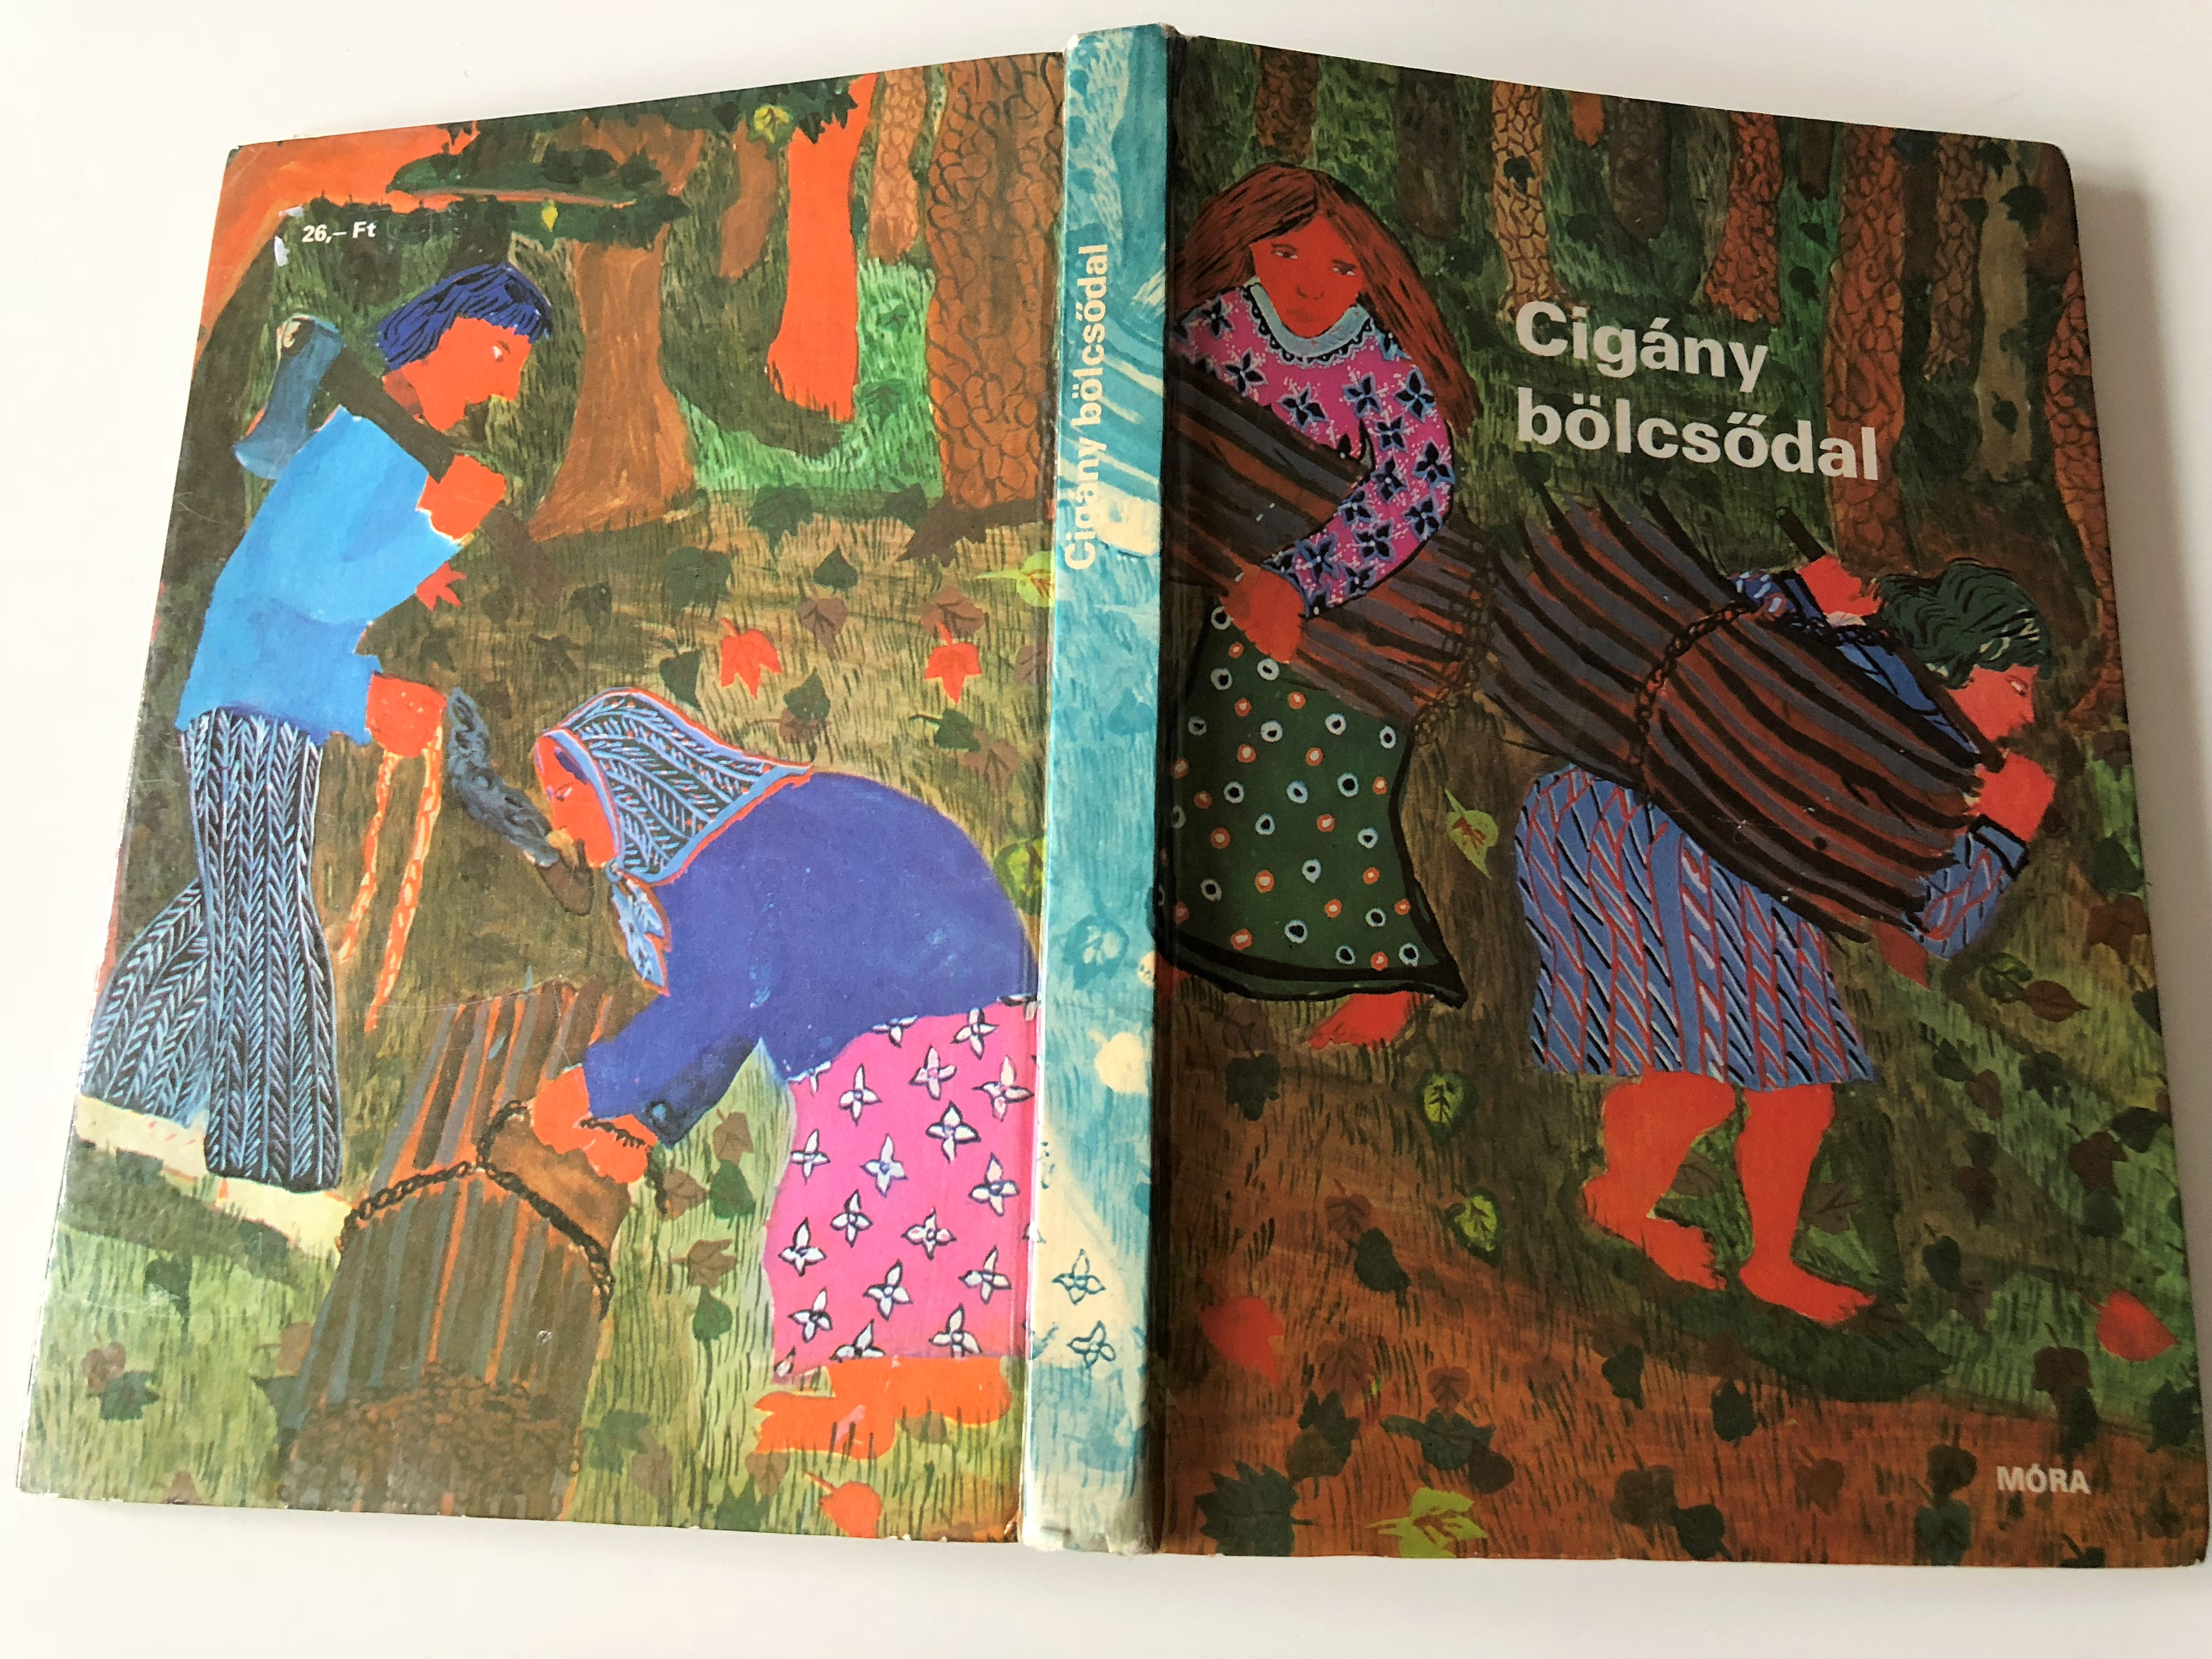 cigany-bolcsodal-mora-2000-gypsy-cradle-song-szego-laszlo-.jpg